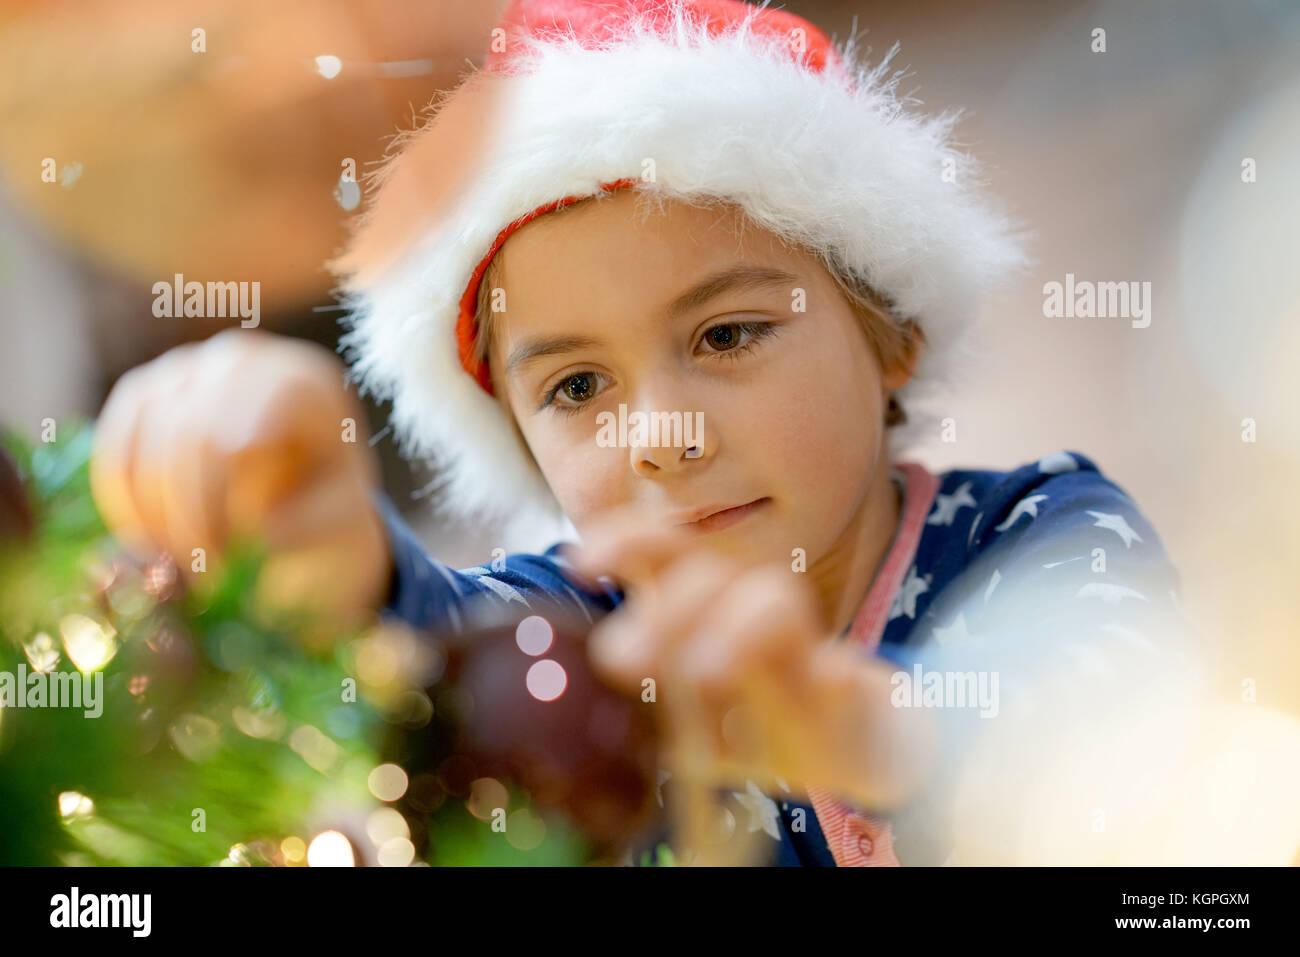 Portrait of cute little boy decorating Christmas tree - Stock Image